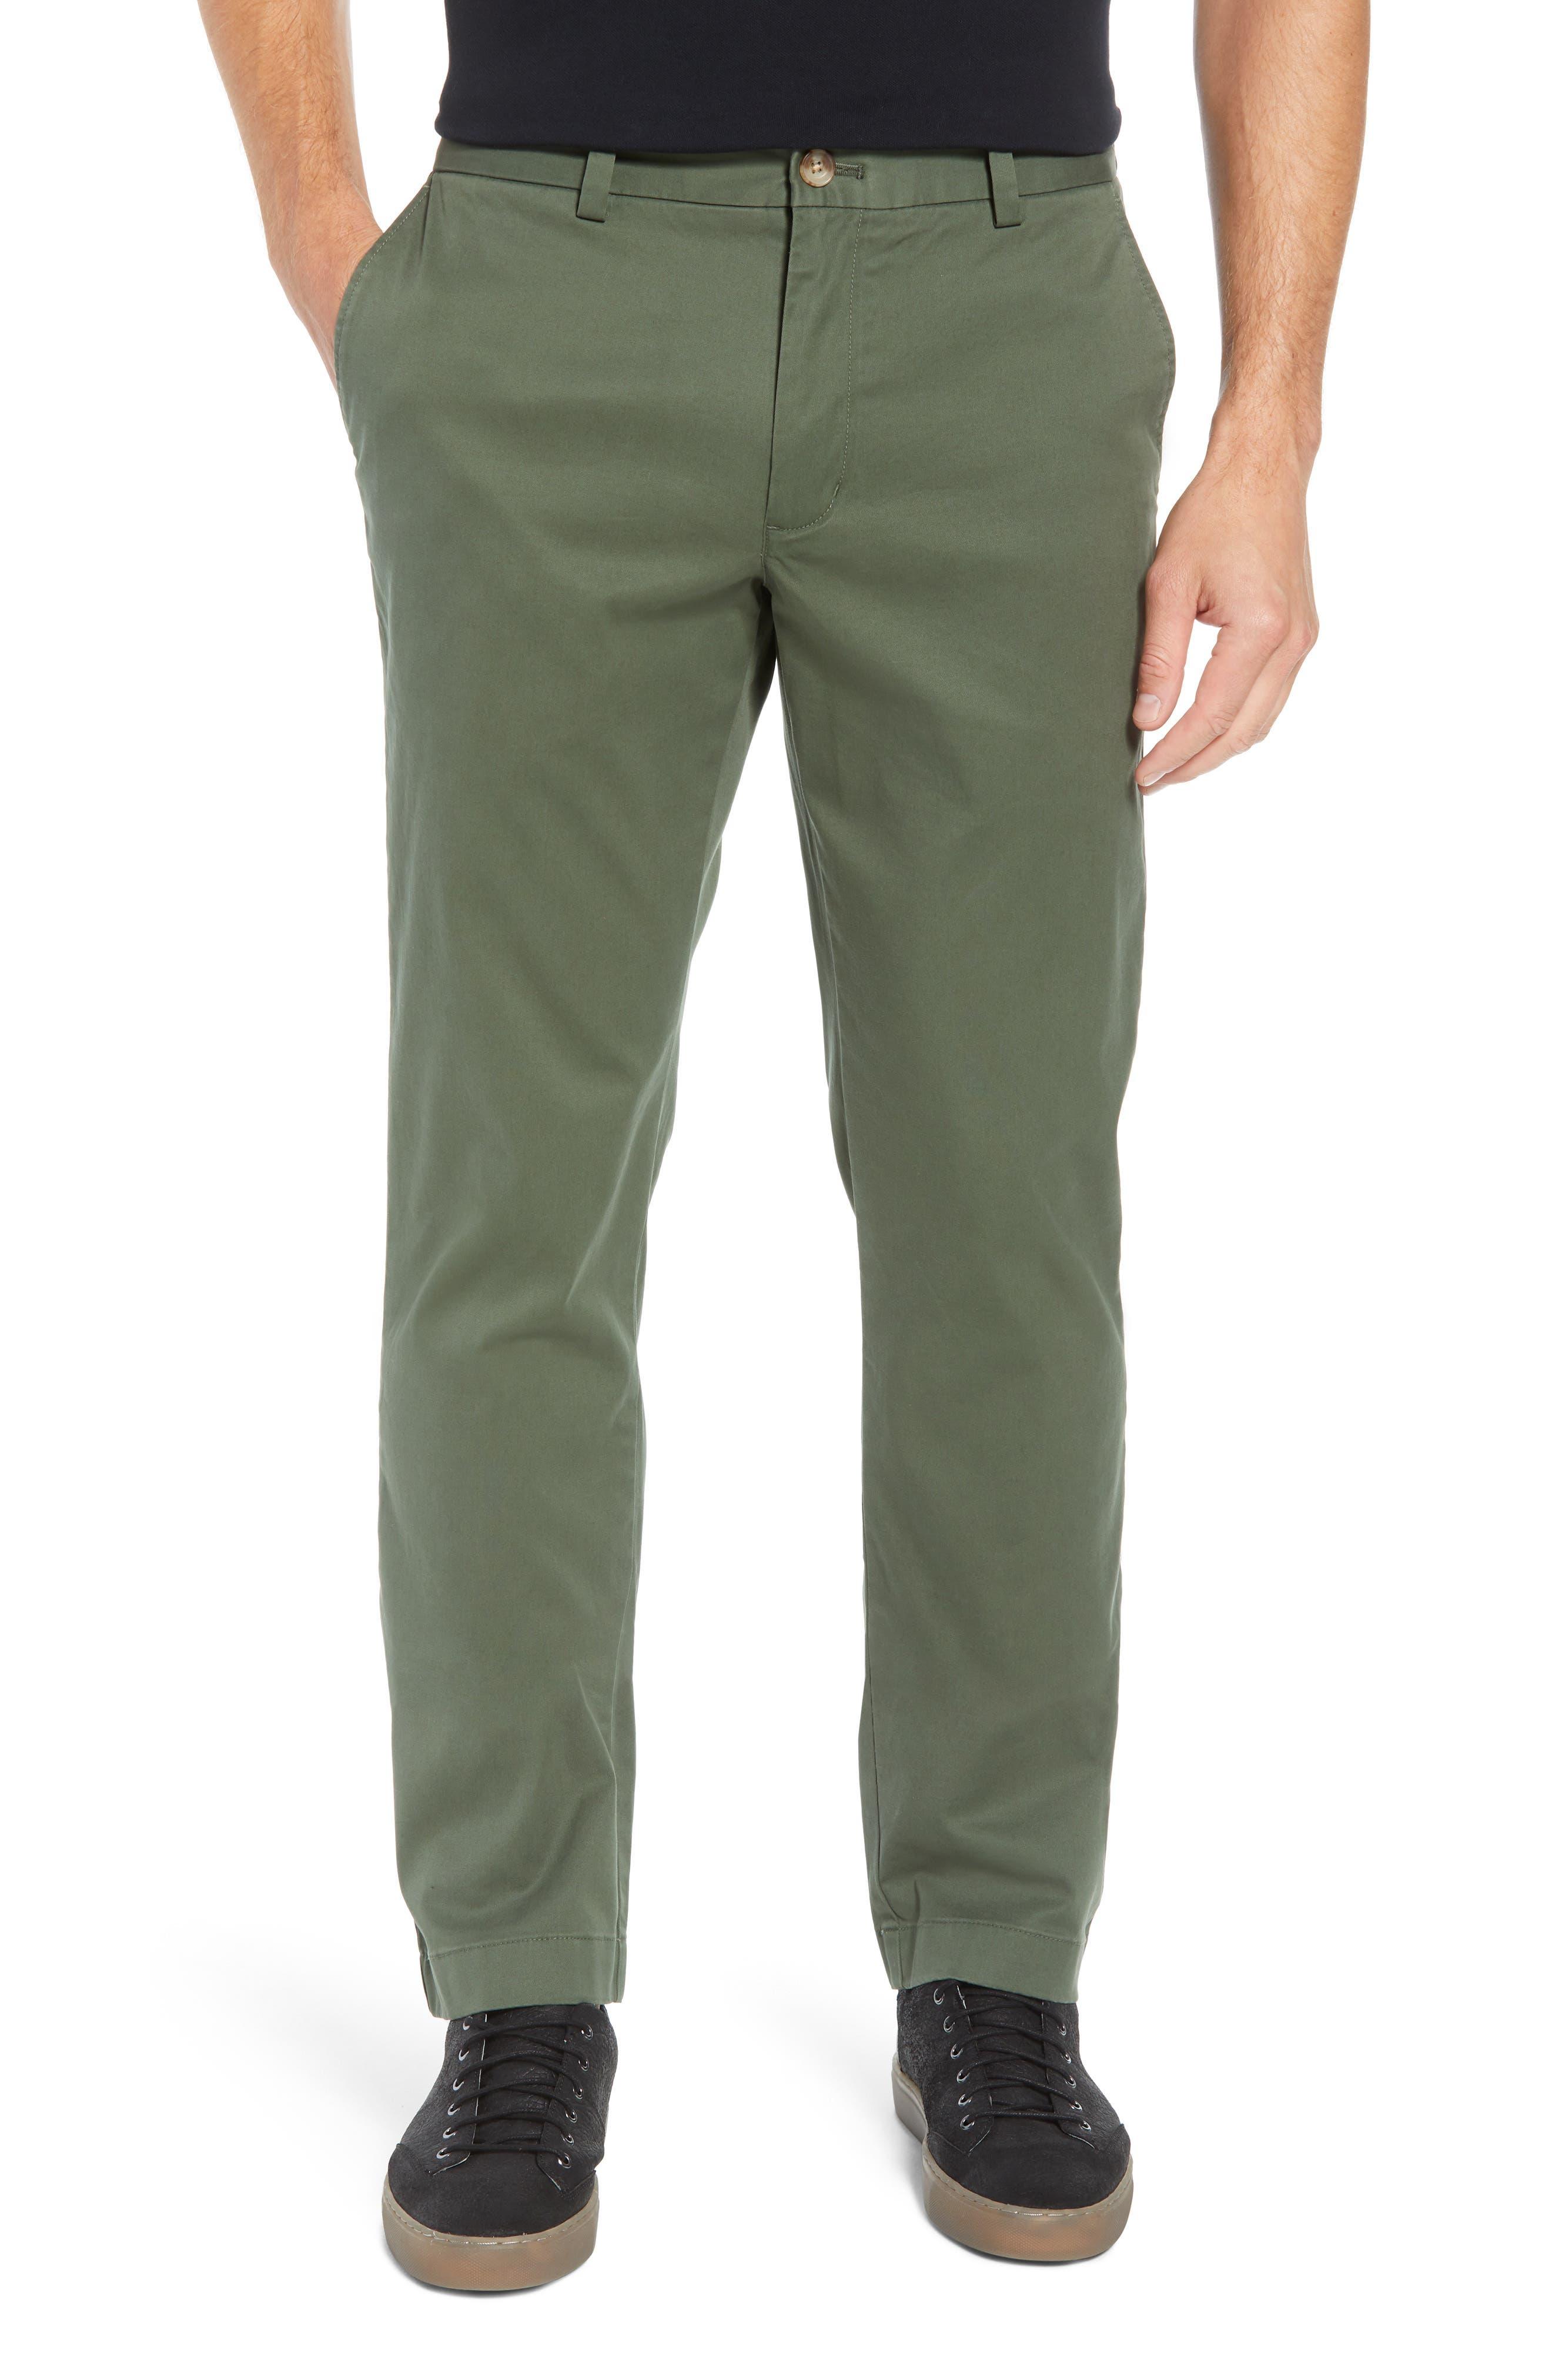 VINEYARD VINES, Breaker Flat Front Stretch Cotton Pants, Main thumbnail 1, color, CARGO GREEN